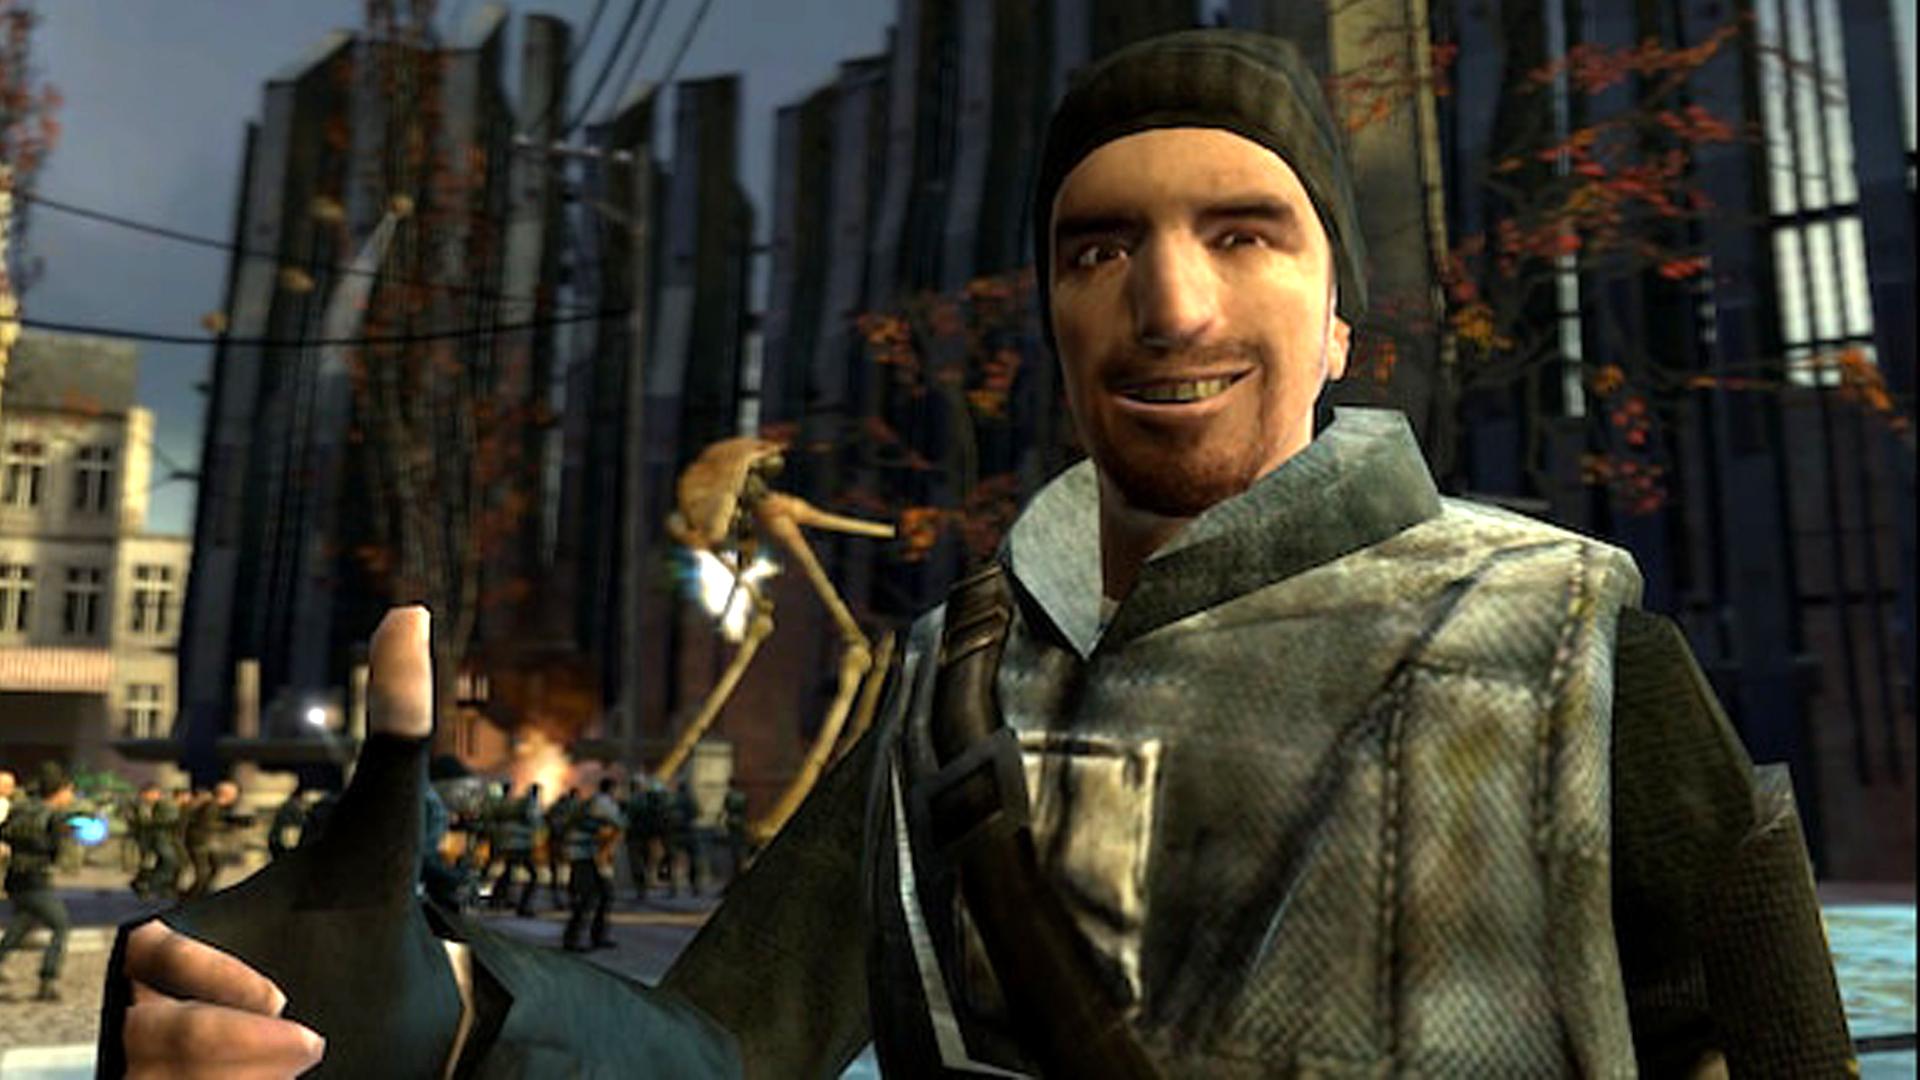 Half-Life 2 community rallies to break its peak player count for reasons